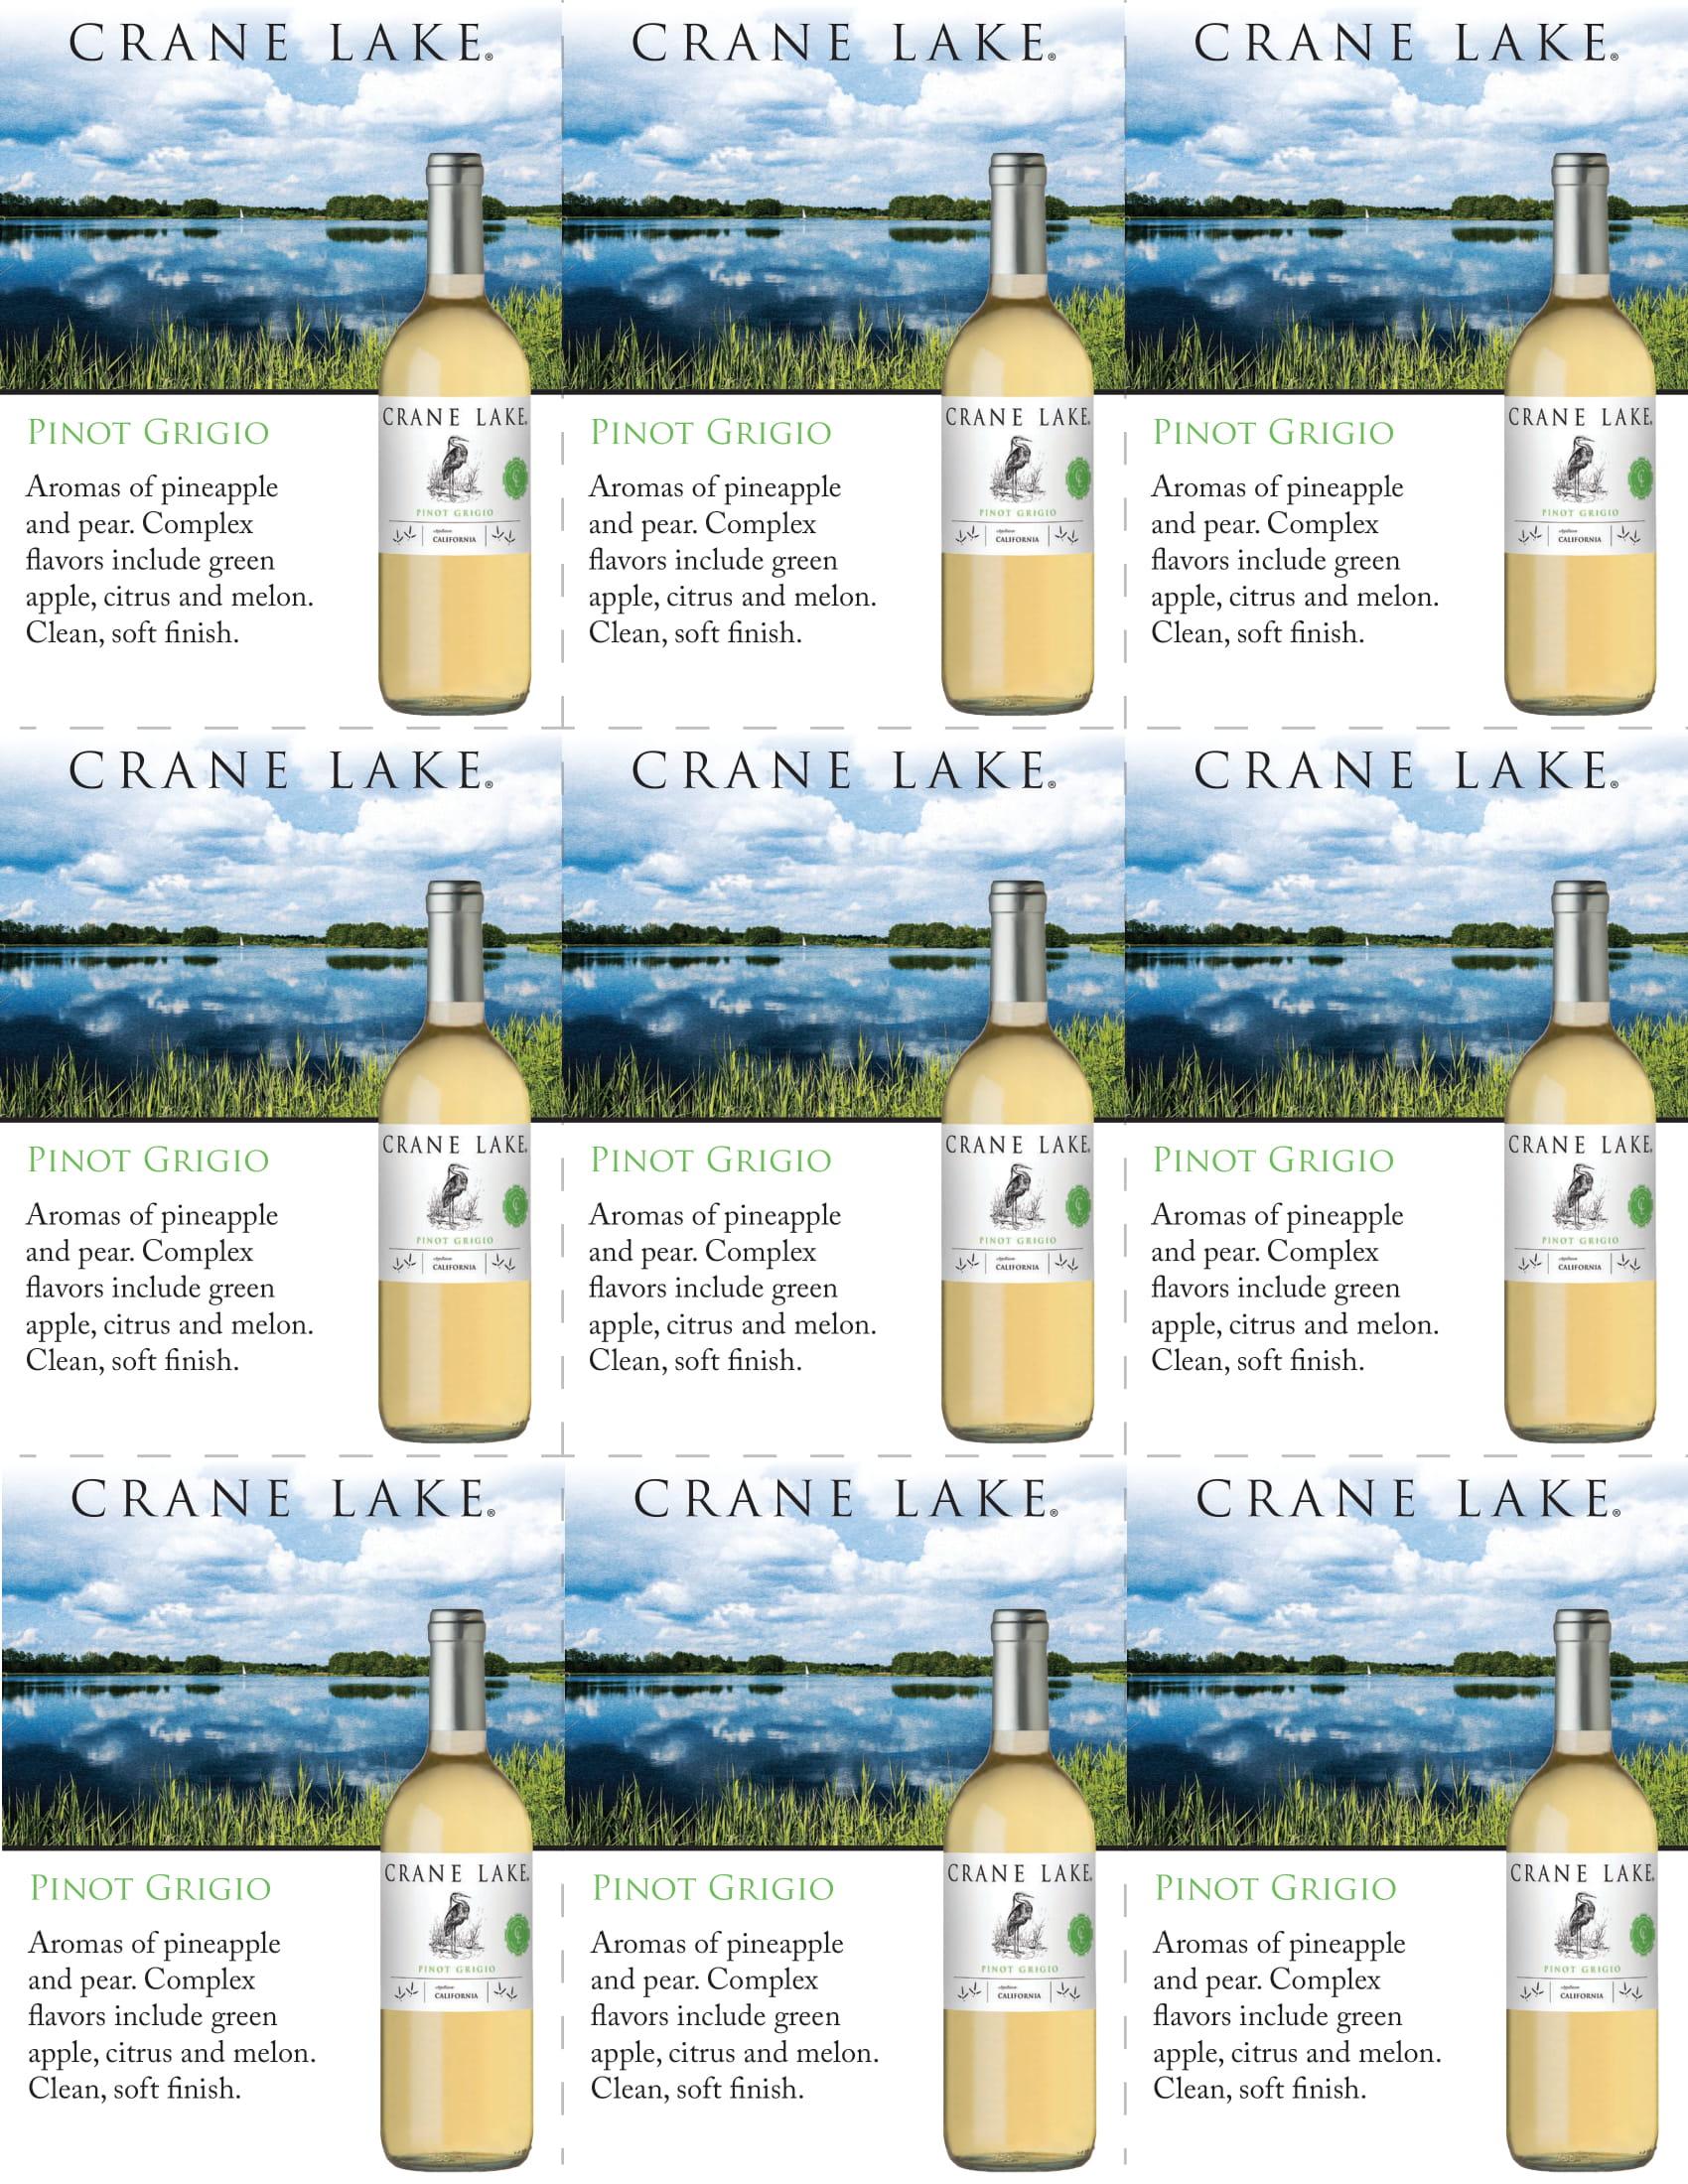 Crane Lake Pinot Grigio Shelf Talkers